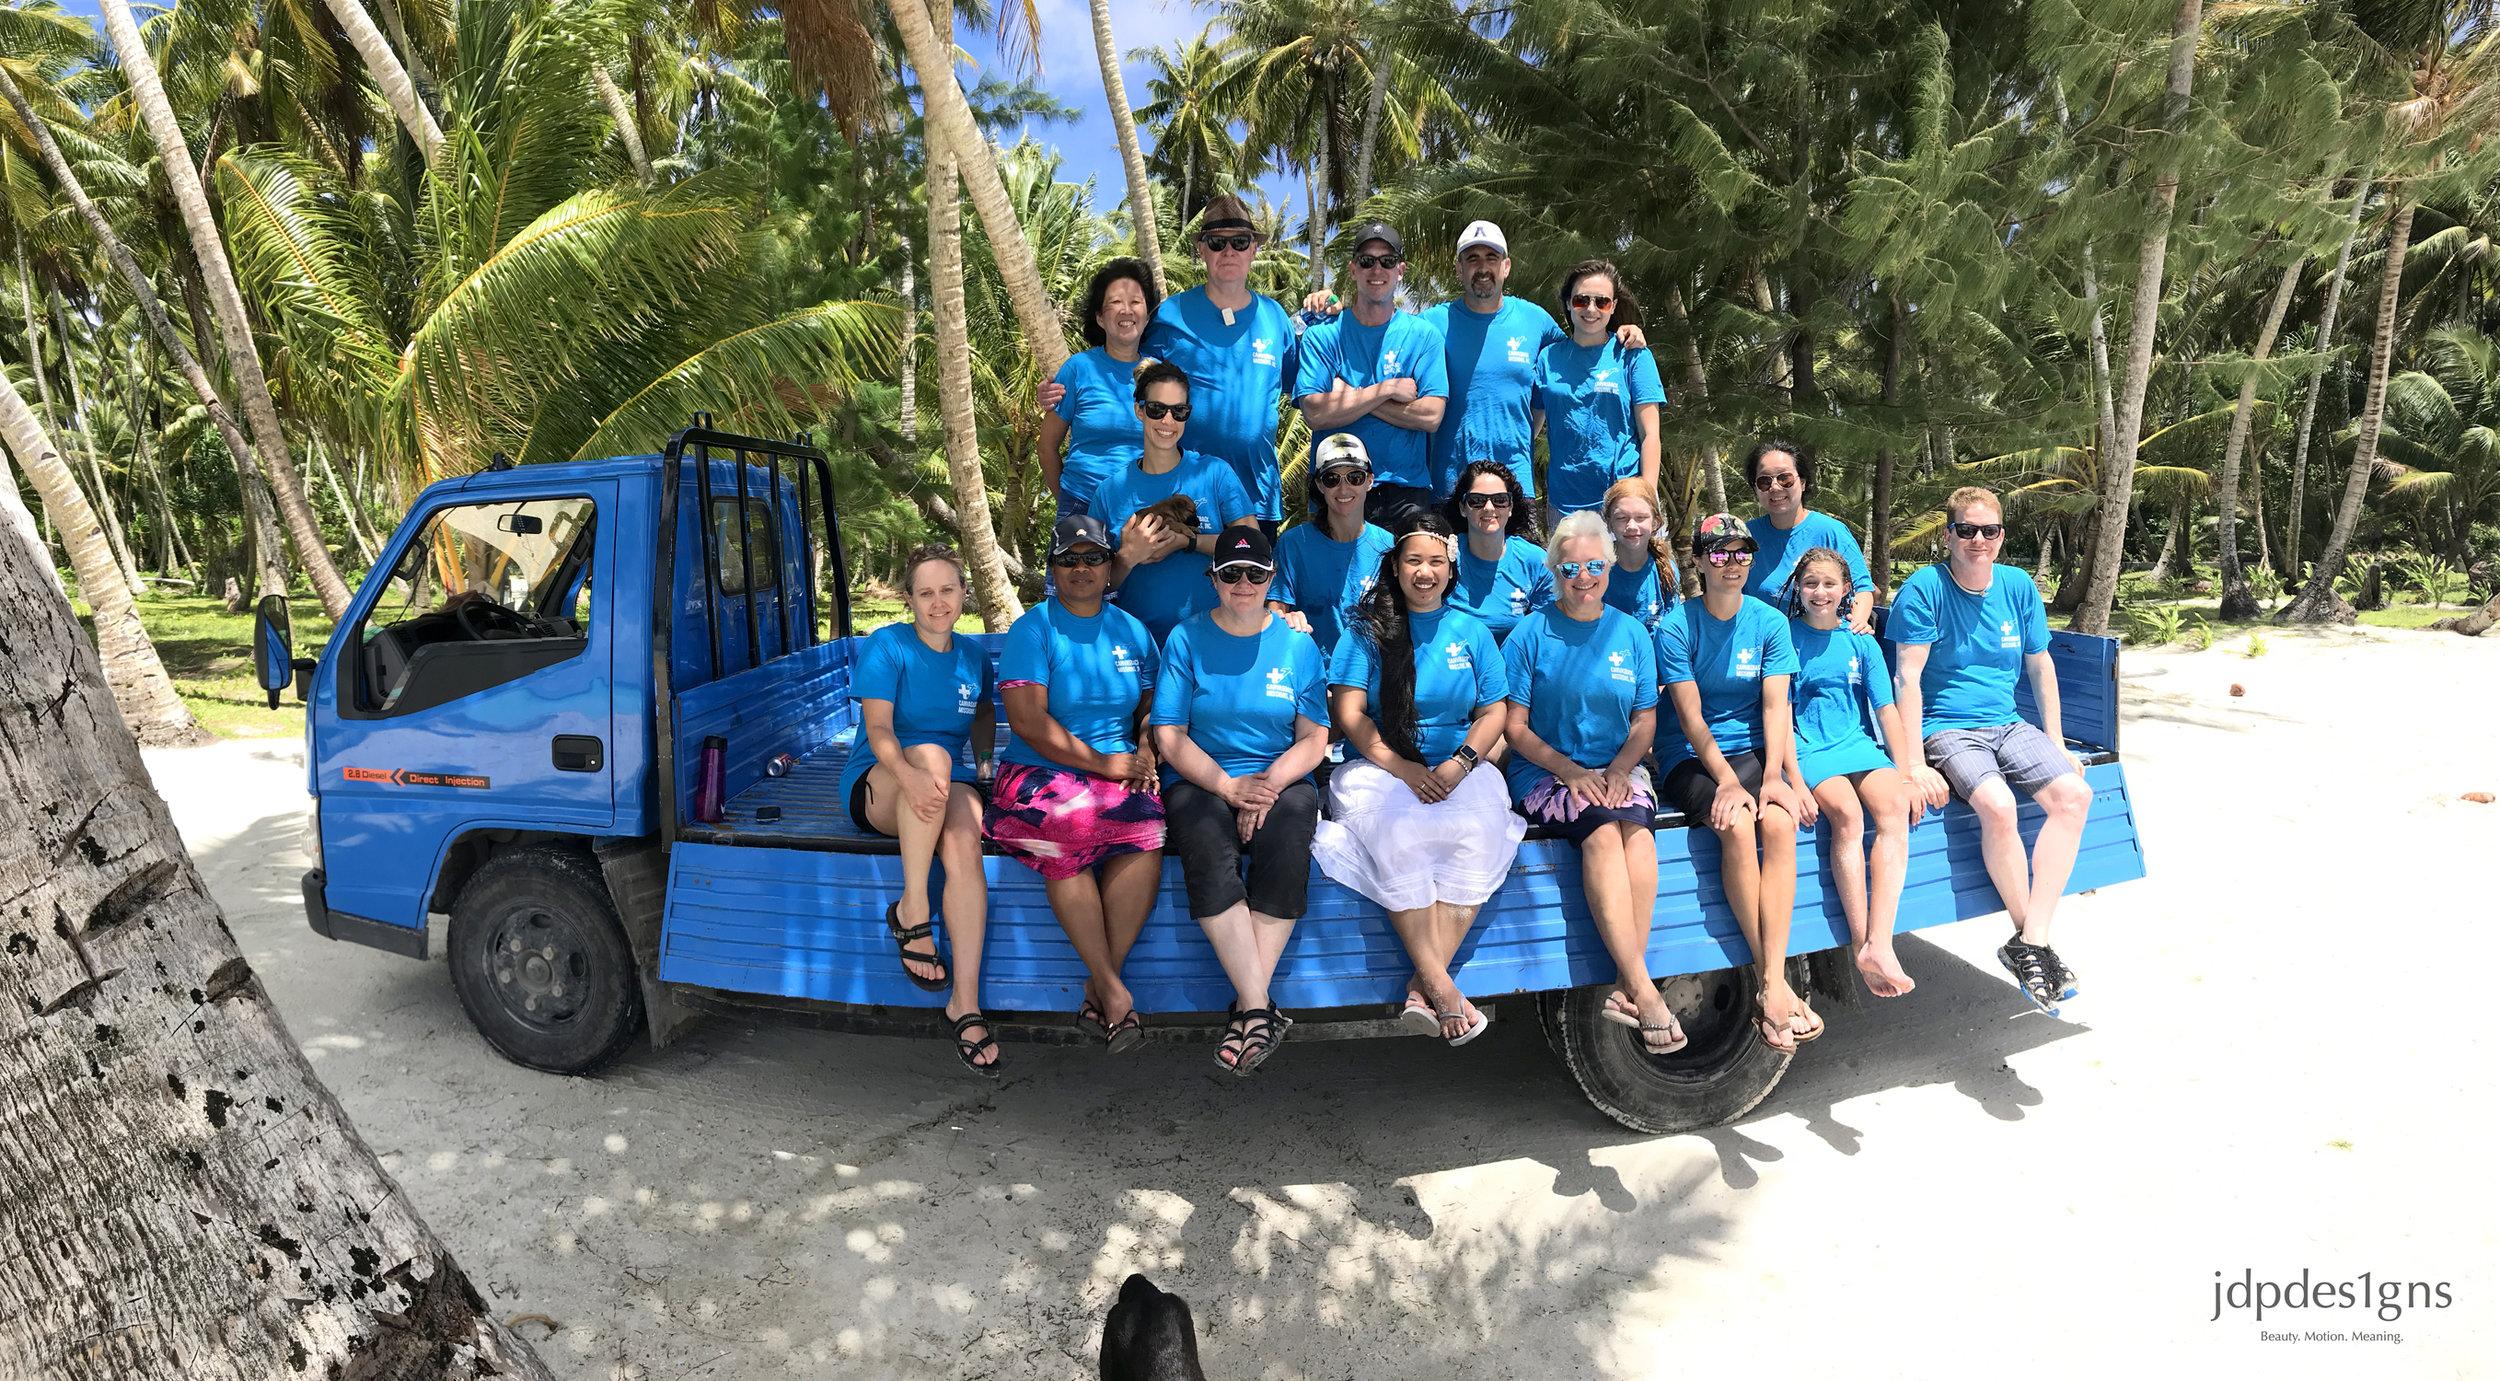 Team Photo Truck Resize.jpg